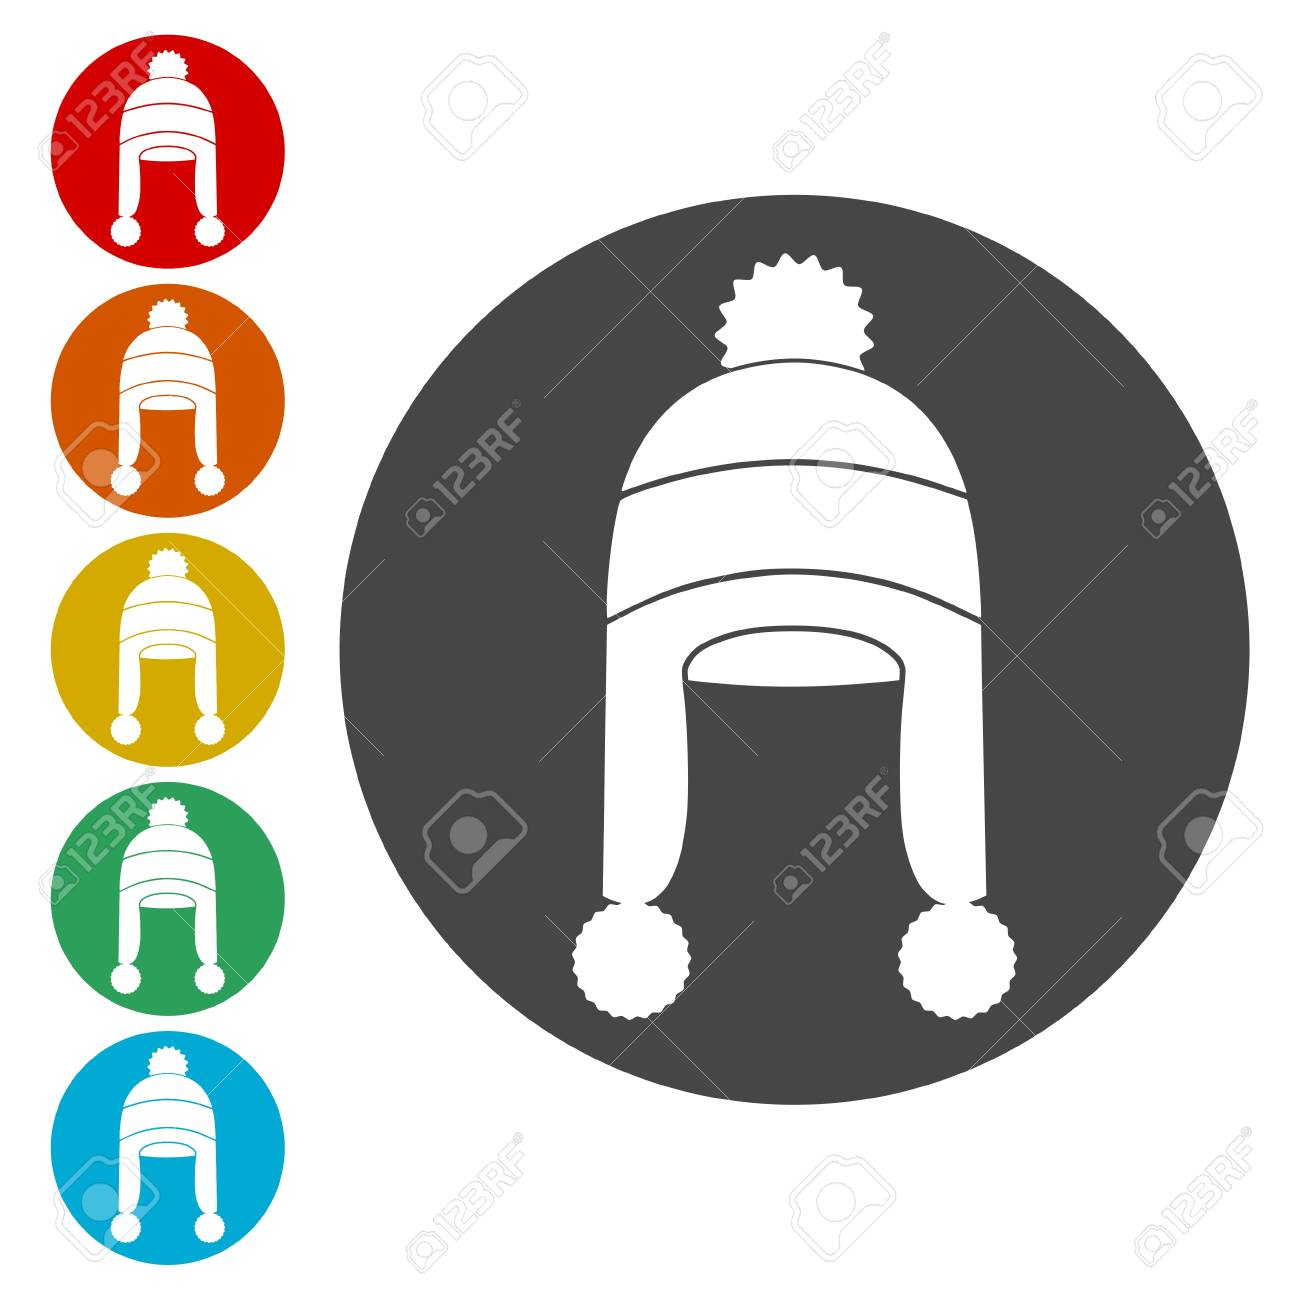 ce8aa7b7bfe Winter Snowboard Cap Icons Set - Vector Illustration Royalty Free ...